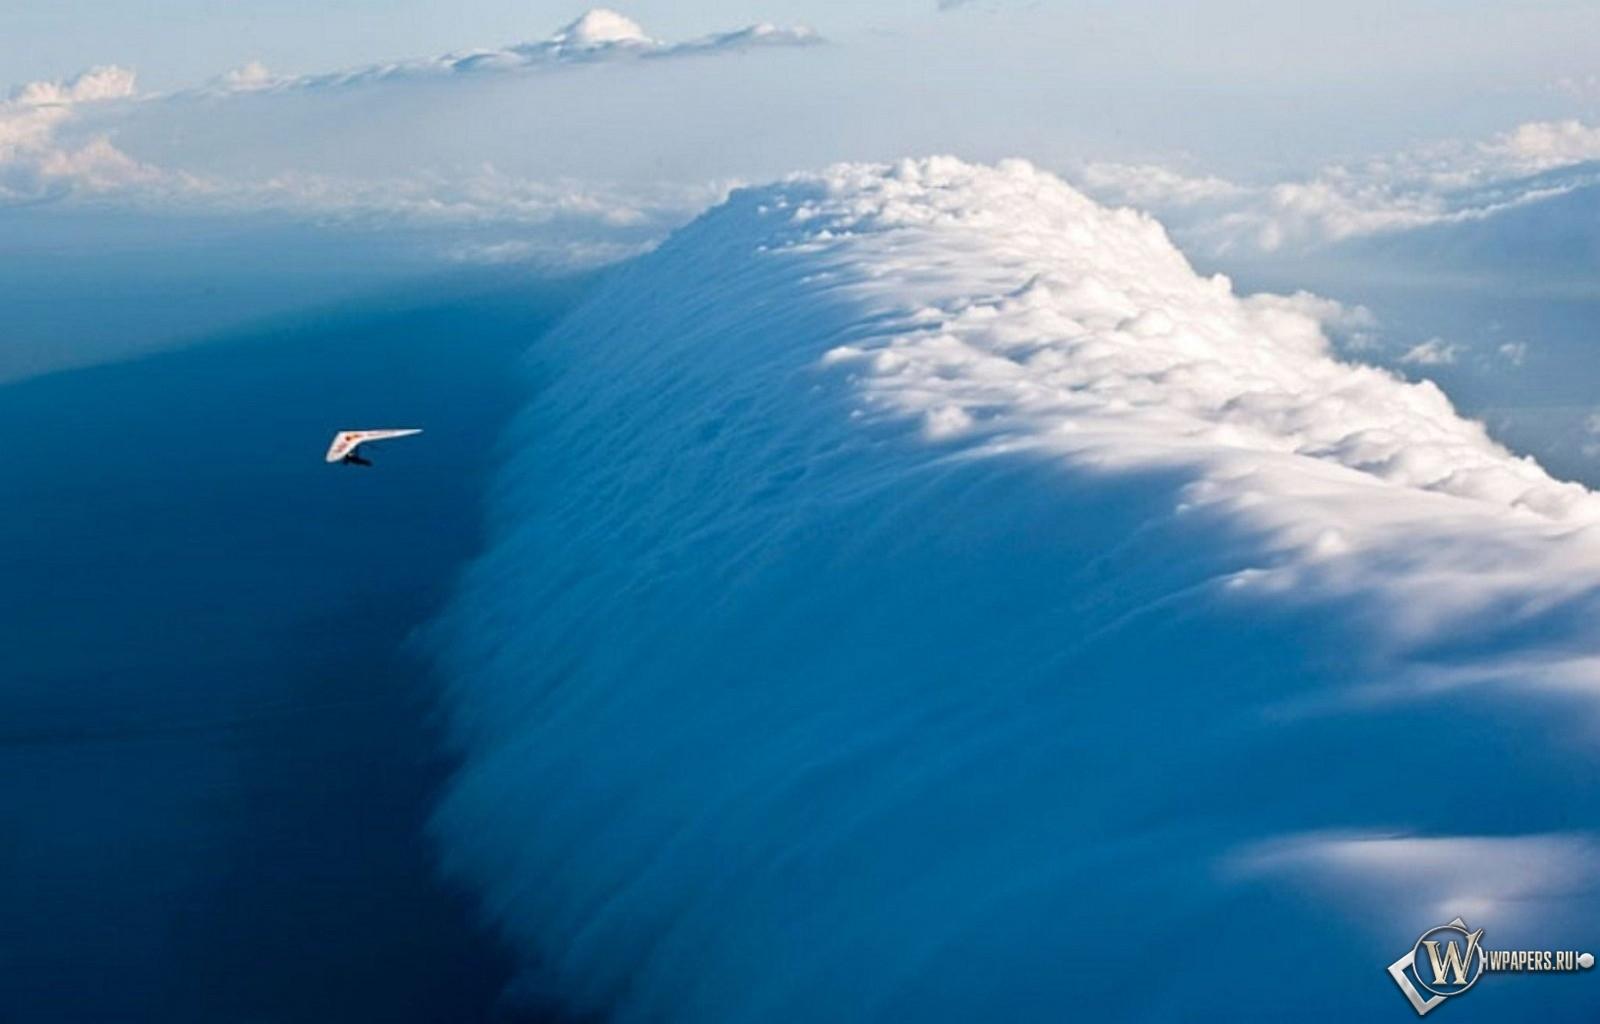 Волна из облаков 1600x1024